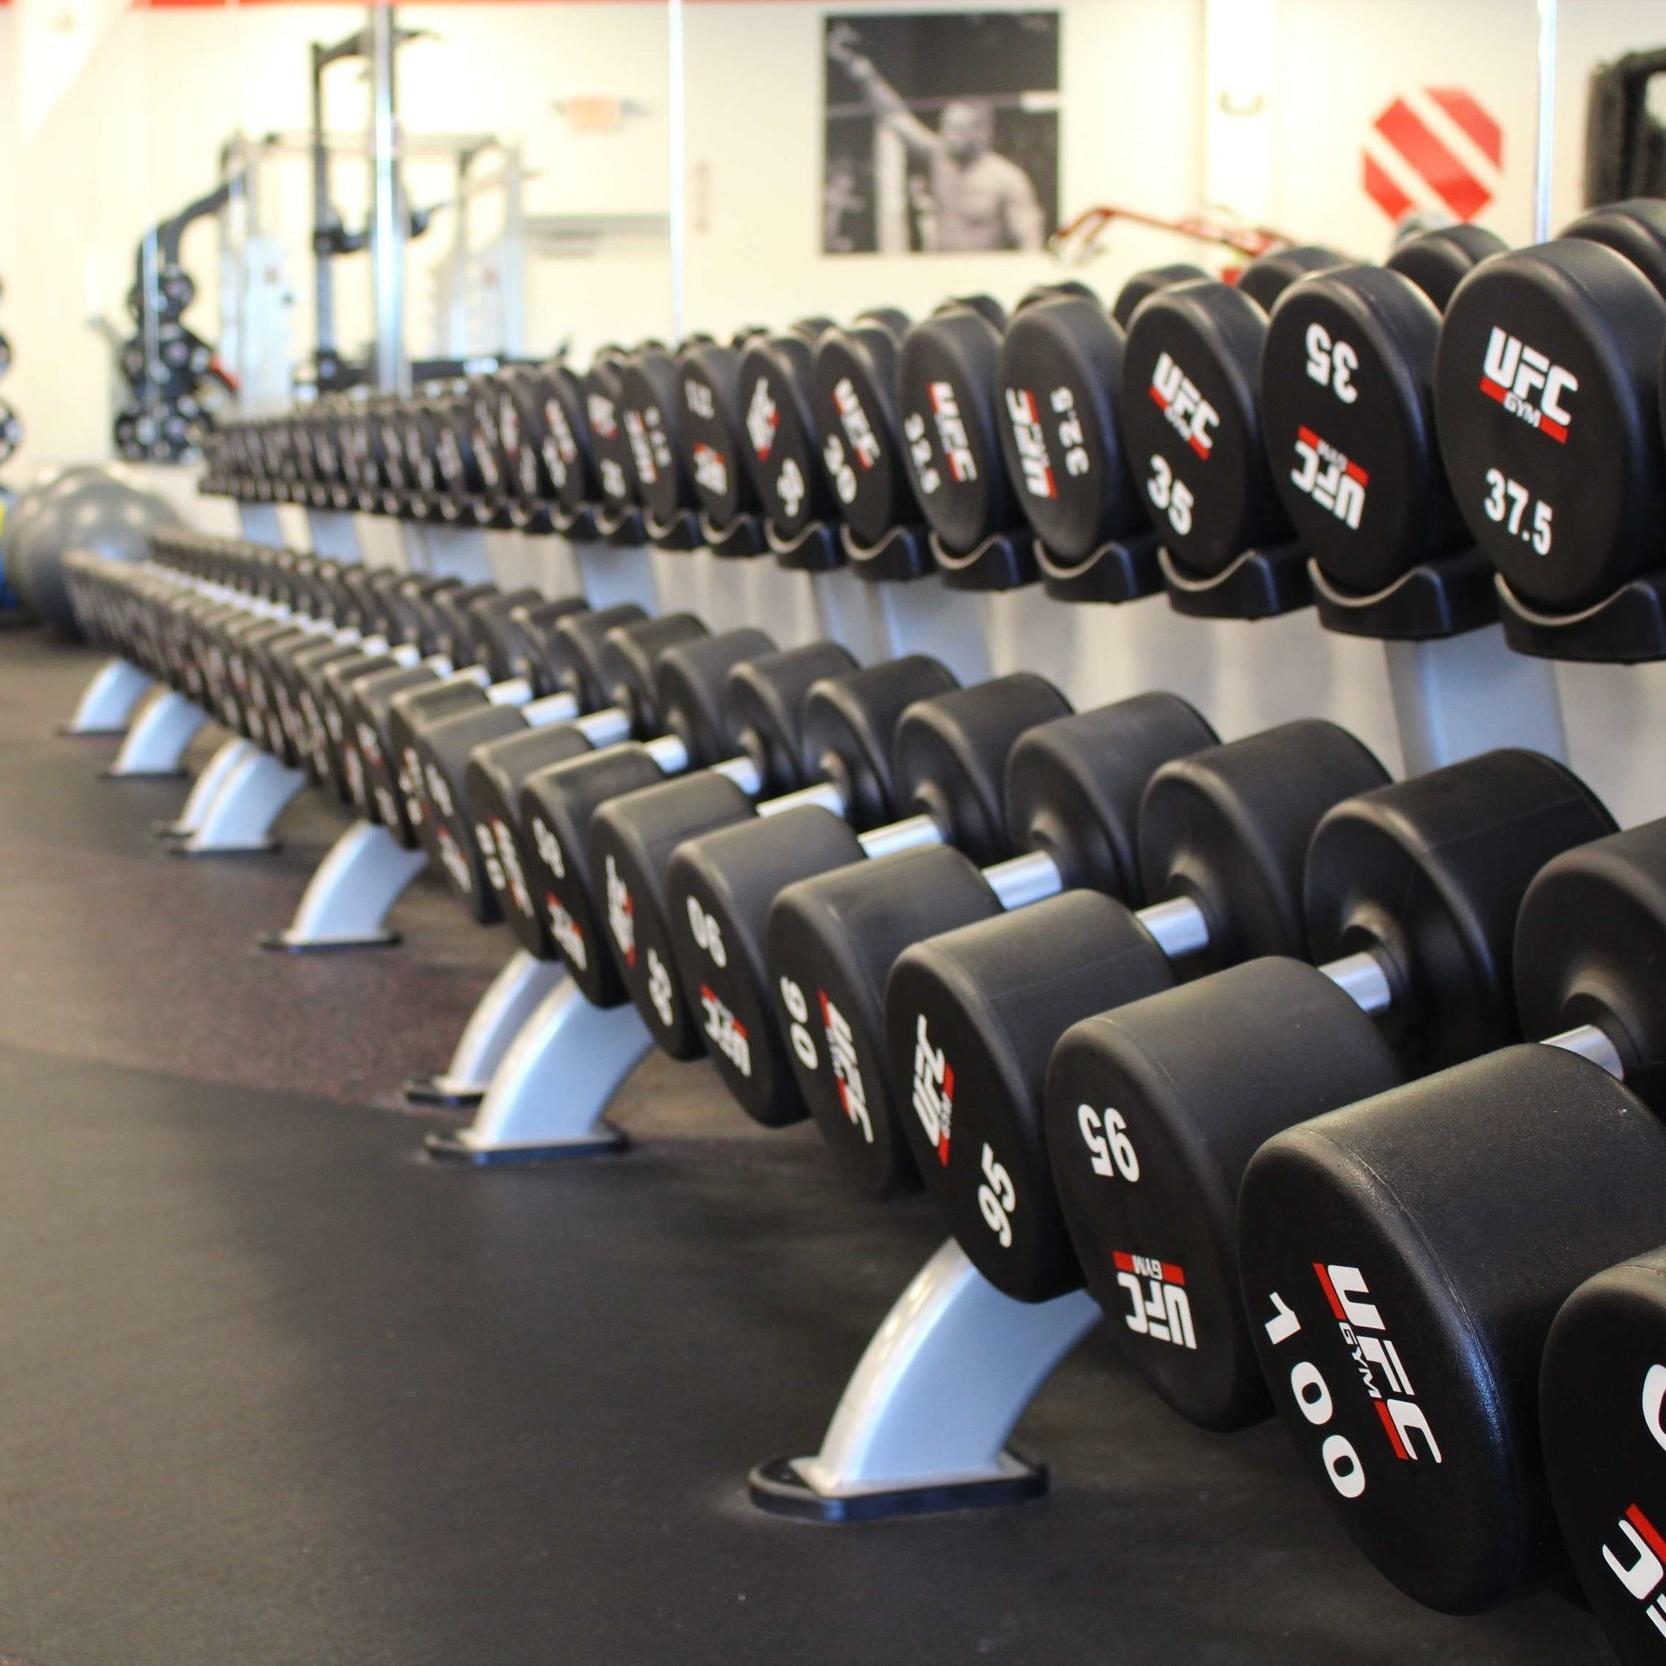 Cardio Weights Gym acrobatics